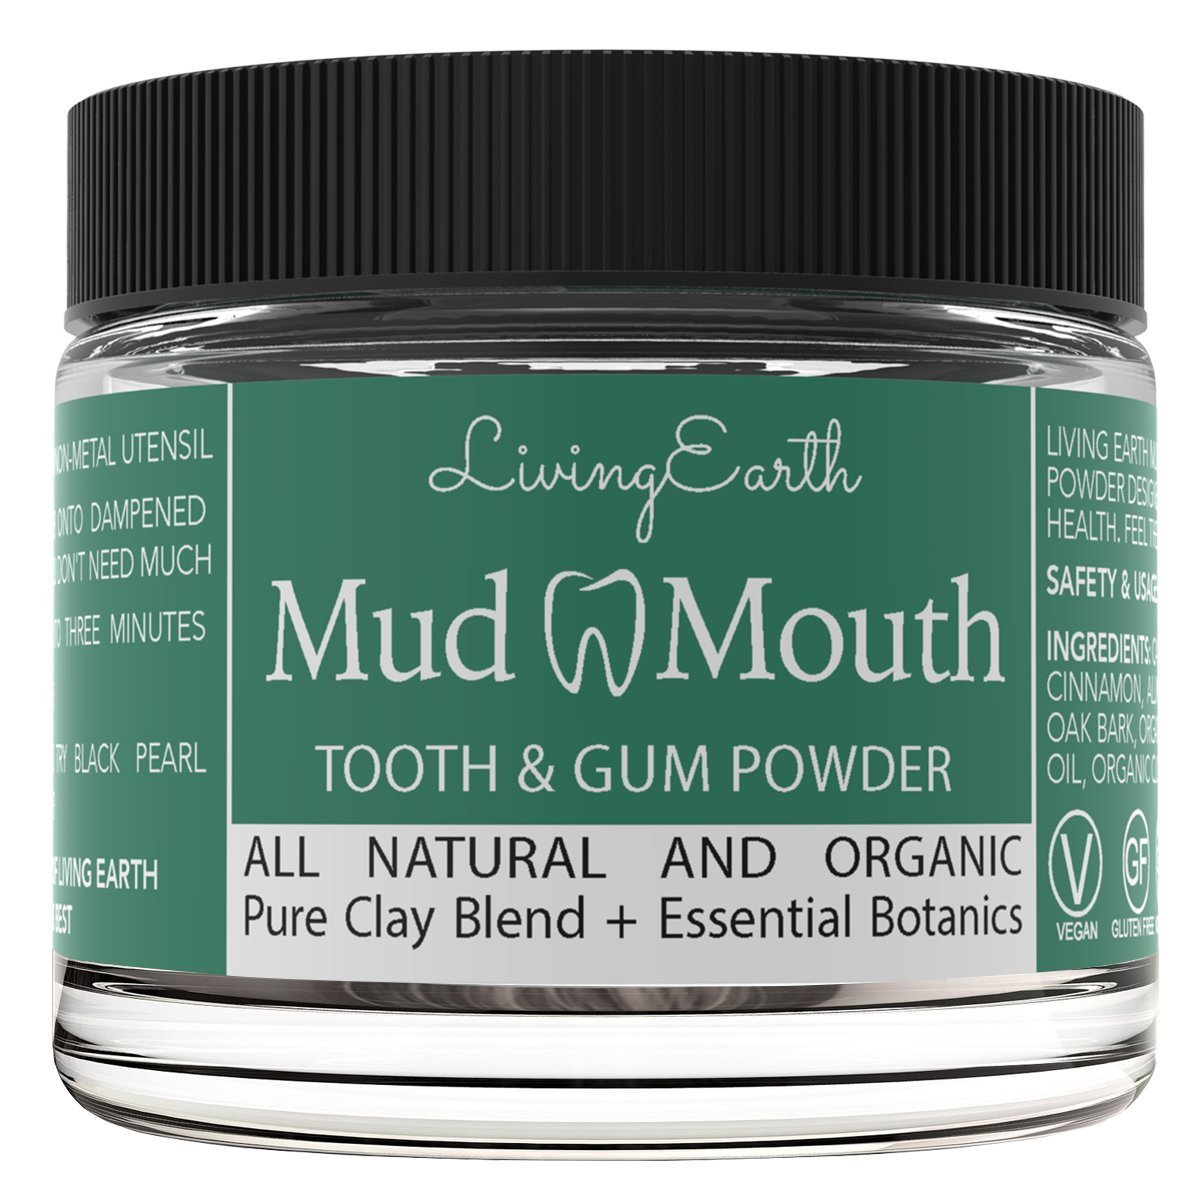 Mud Mouth All Natural Organic Tooth Powder For Sensitive Teeth, Toothache, Loose Teeth, Receding Gums, & Organic Teeth Whitening